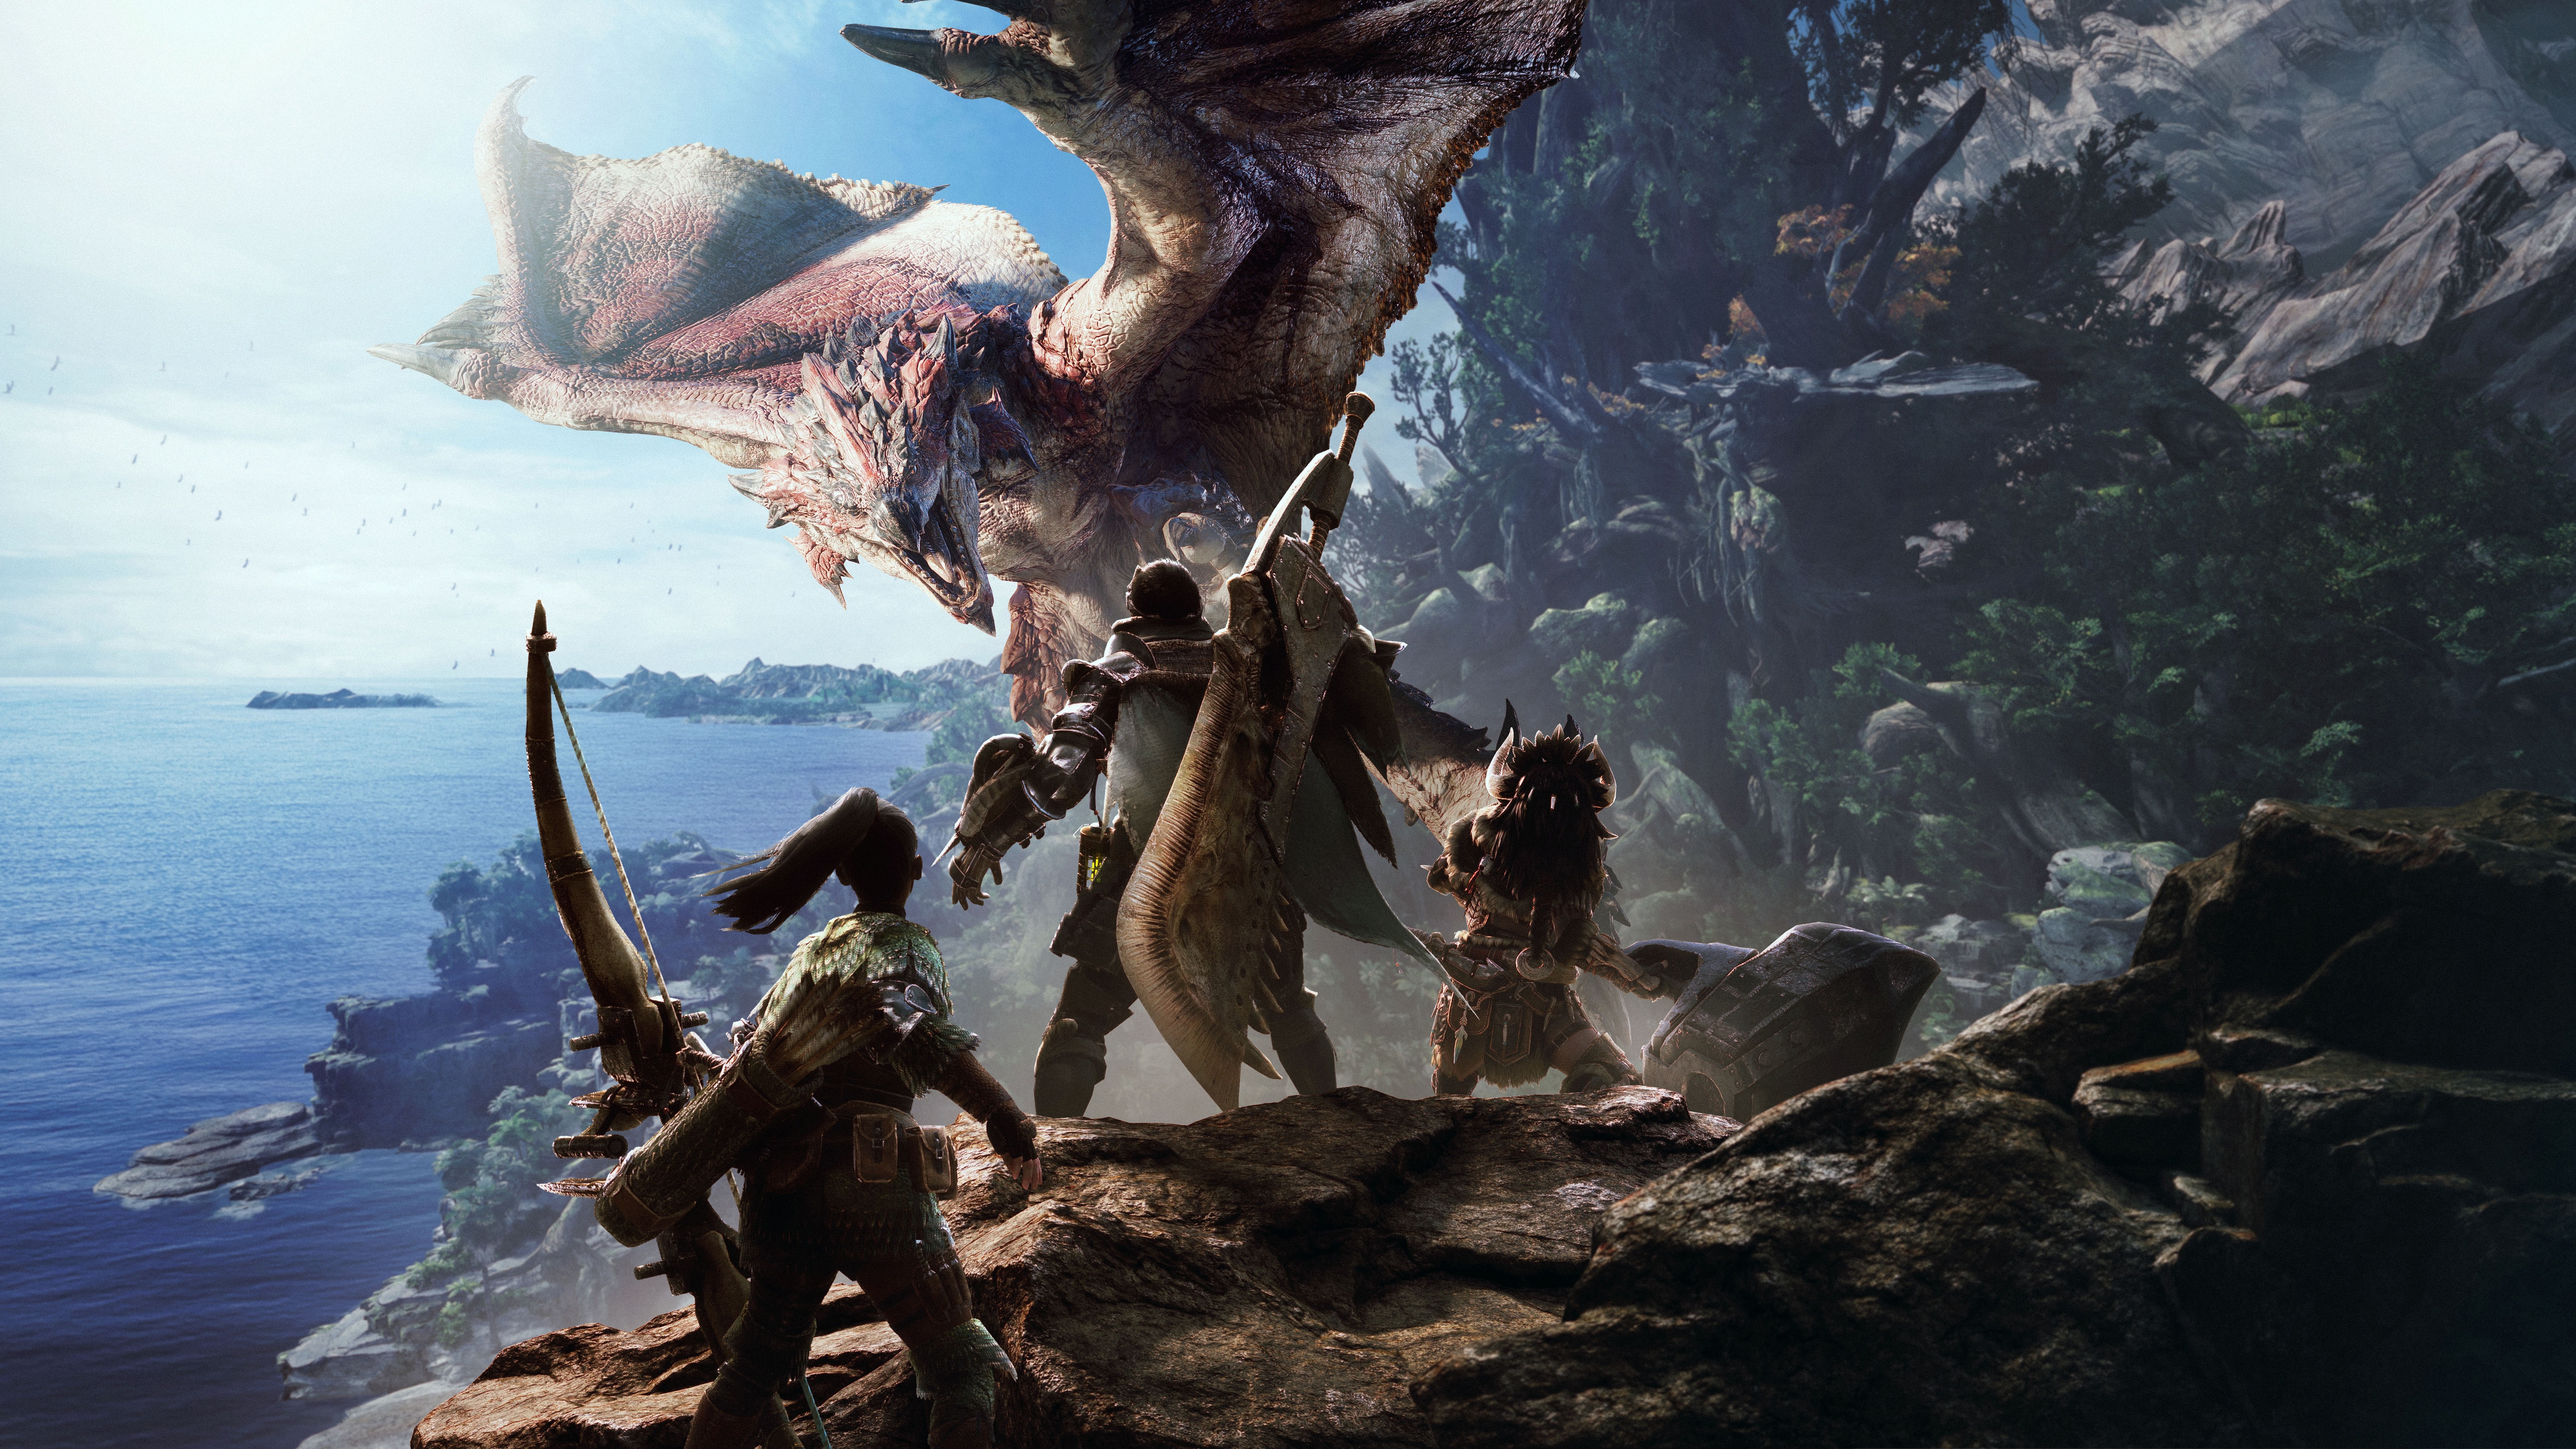 Охота на дракона - Monster Hunter: World 8K, Арт